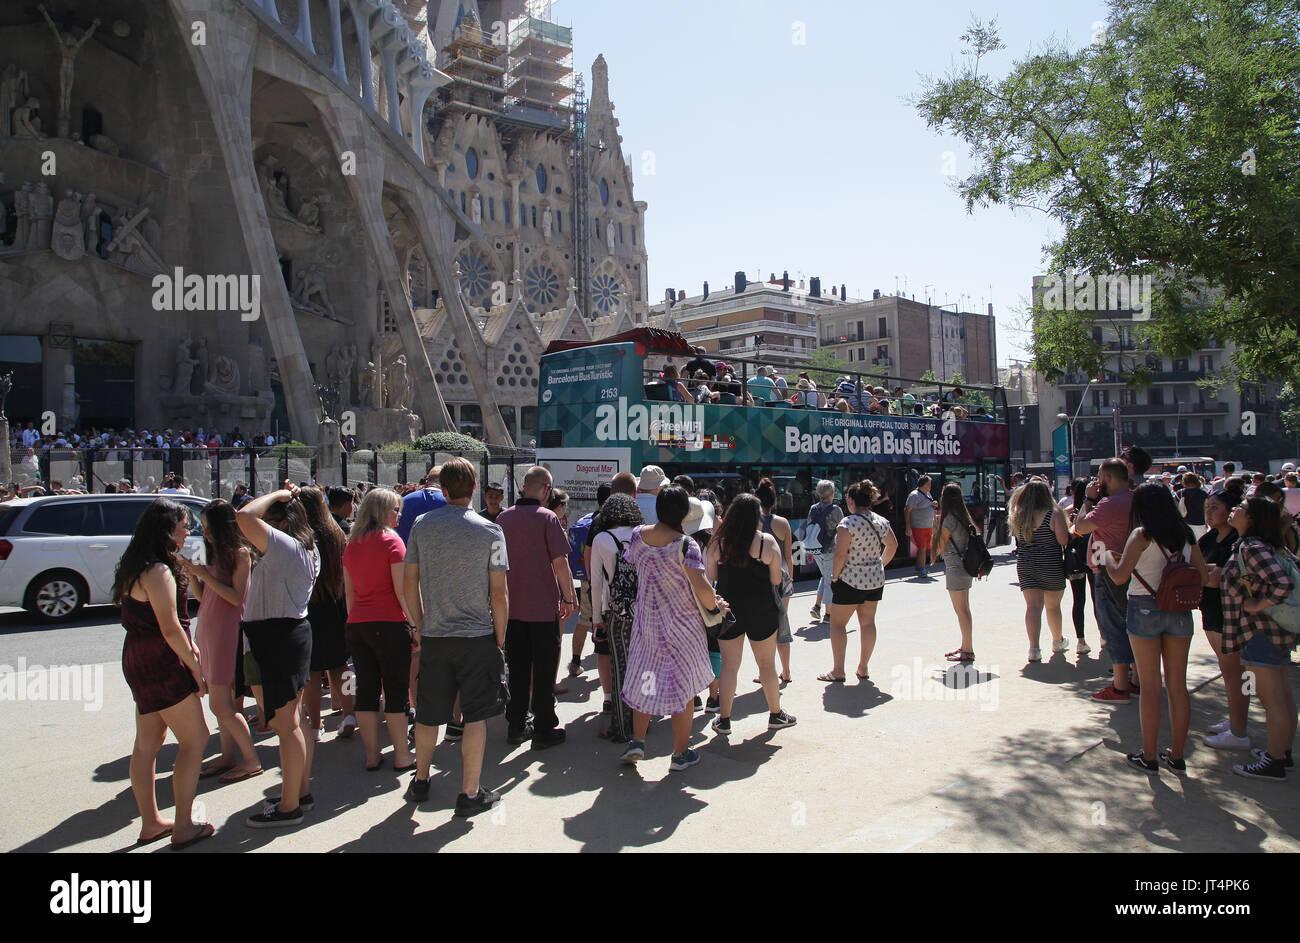 Barcelona Massentourismus im La Sagrada Familia. Spanien Stockbild